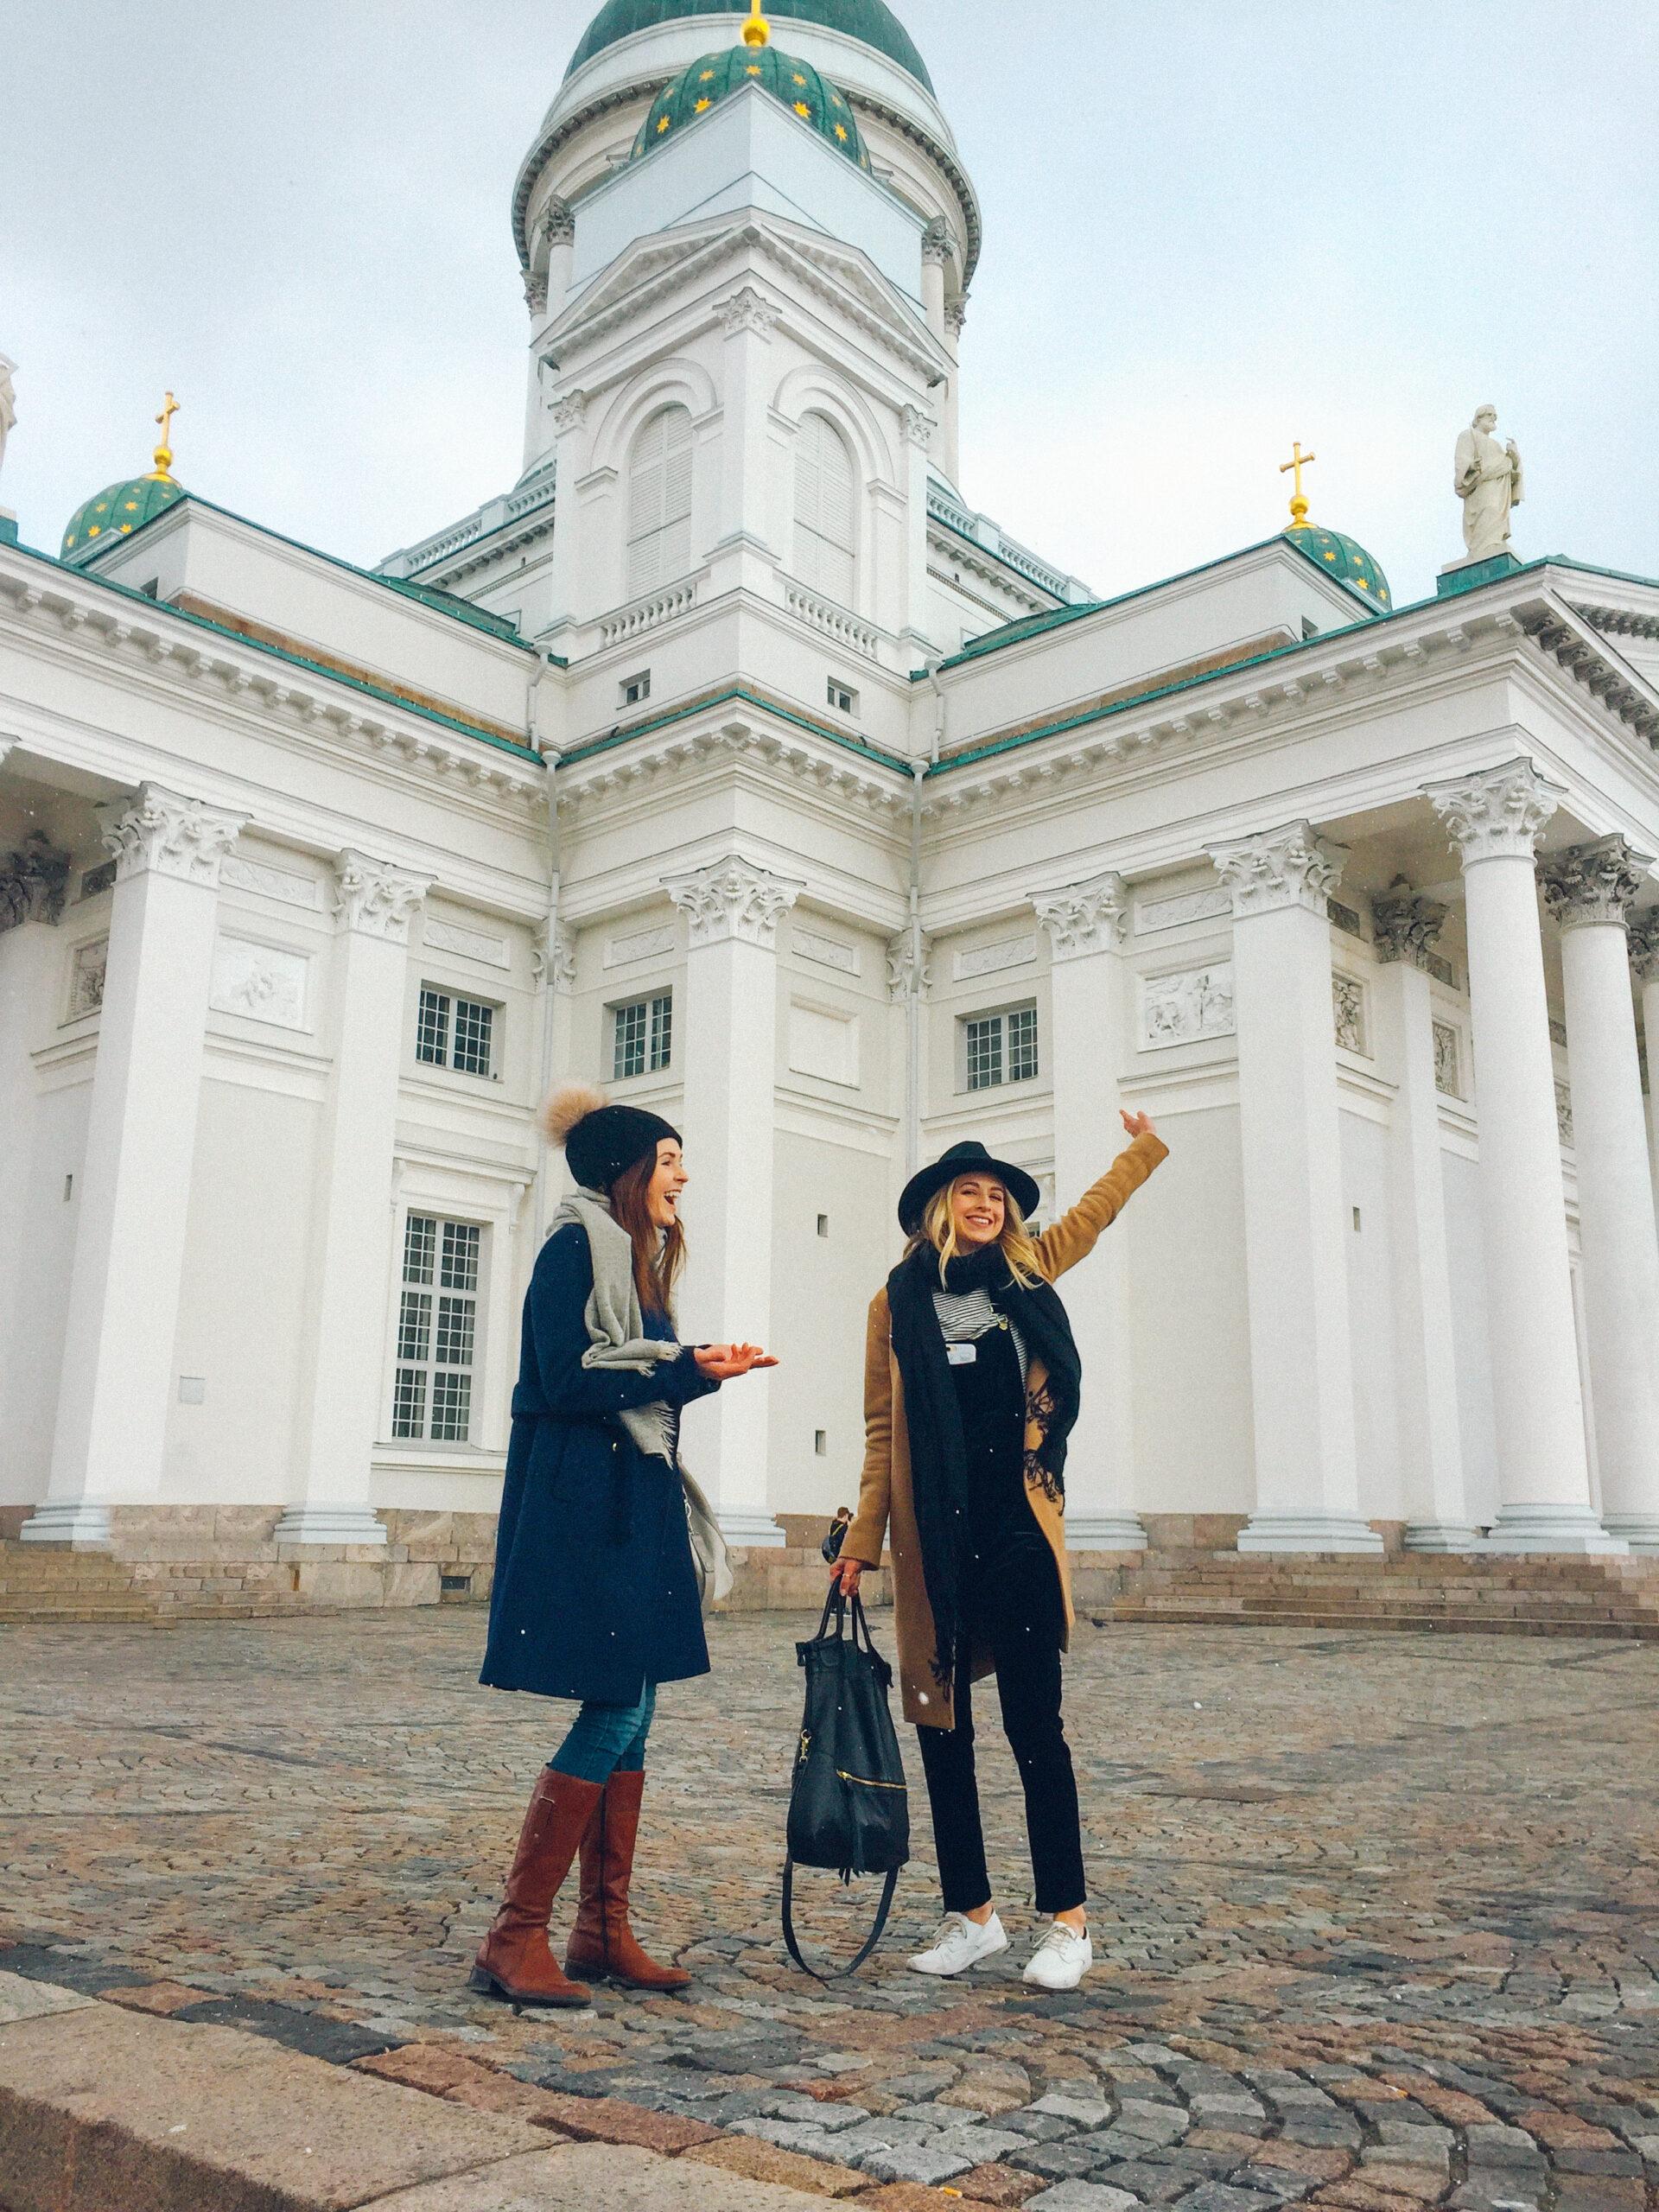 Why I Find Freedom In Helsinki